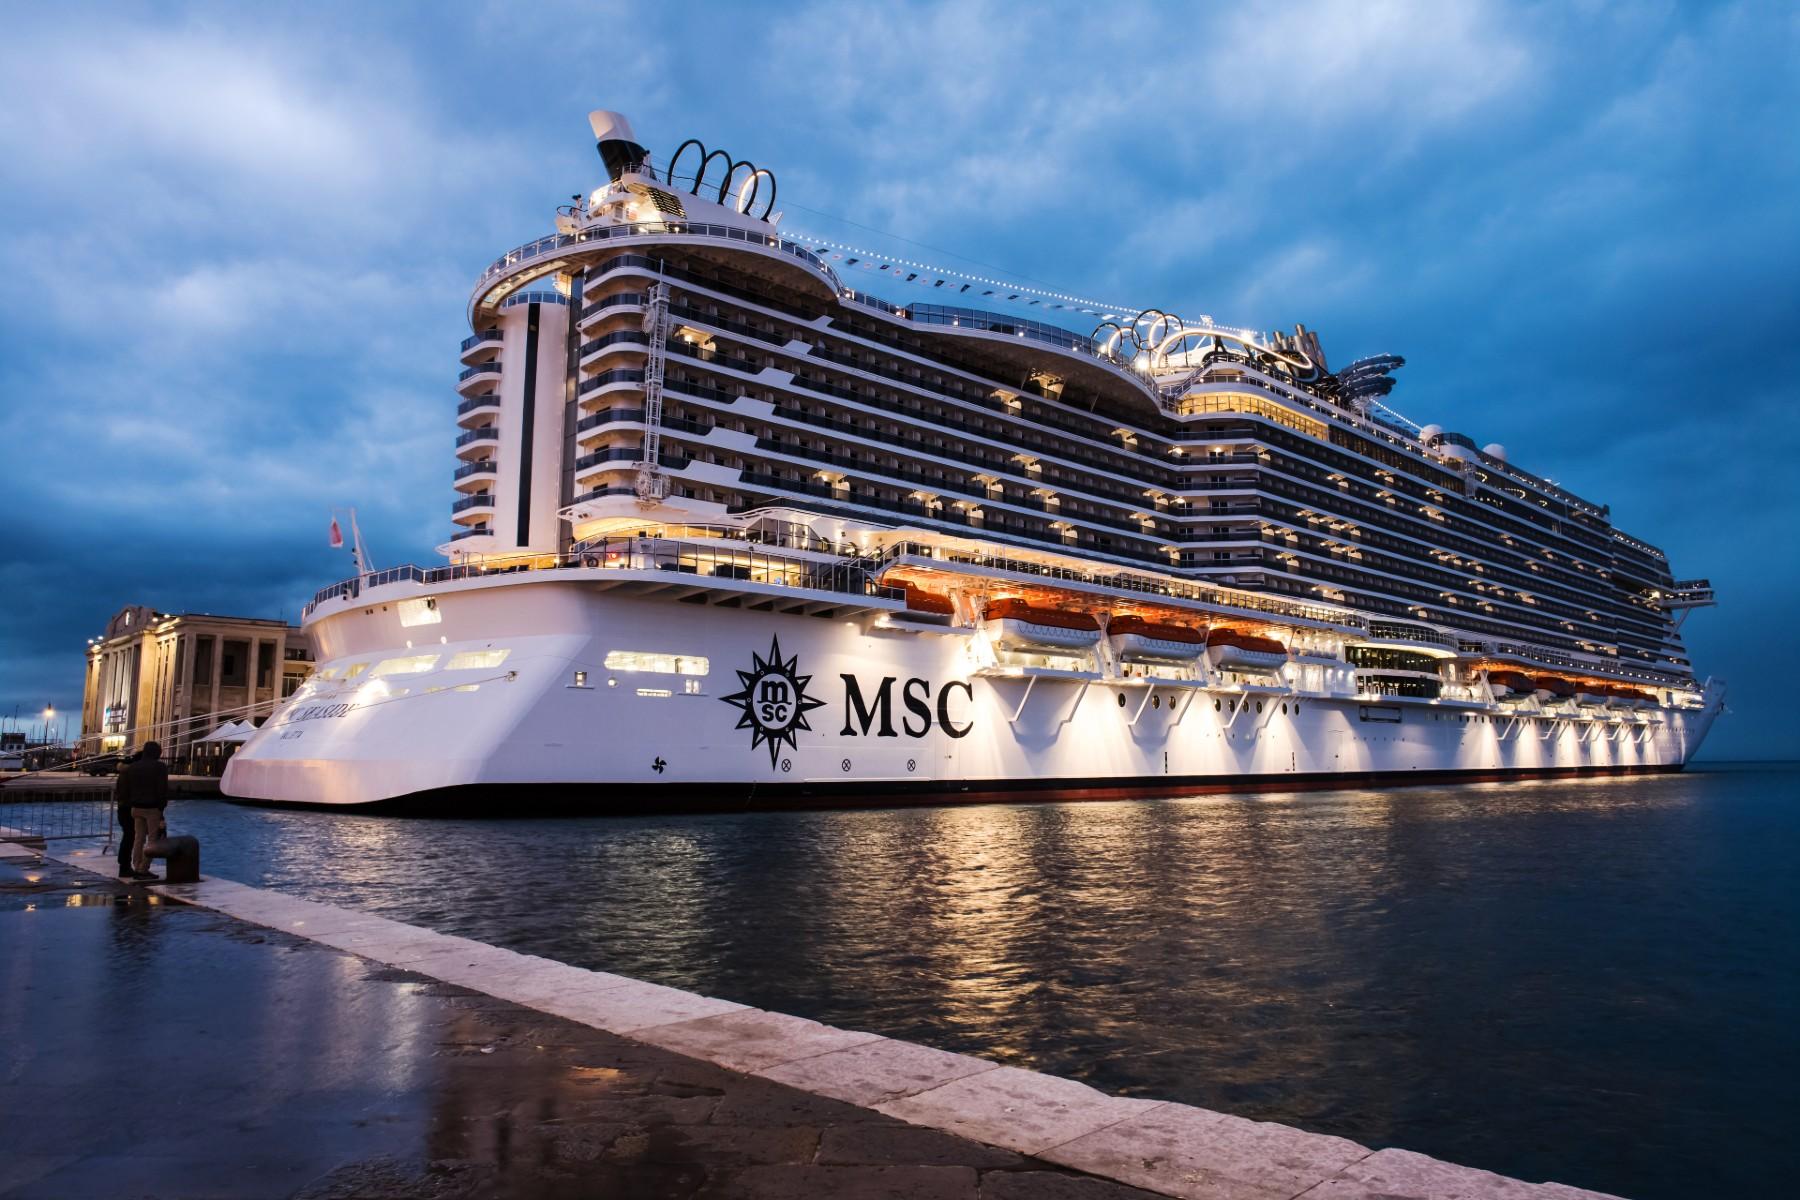 HSC cruises, Swiss Billionaires